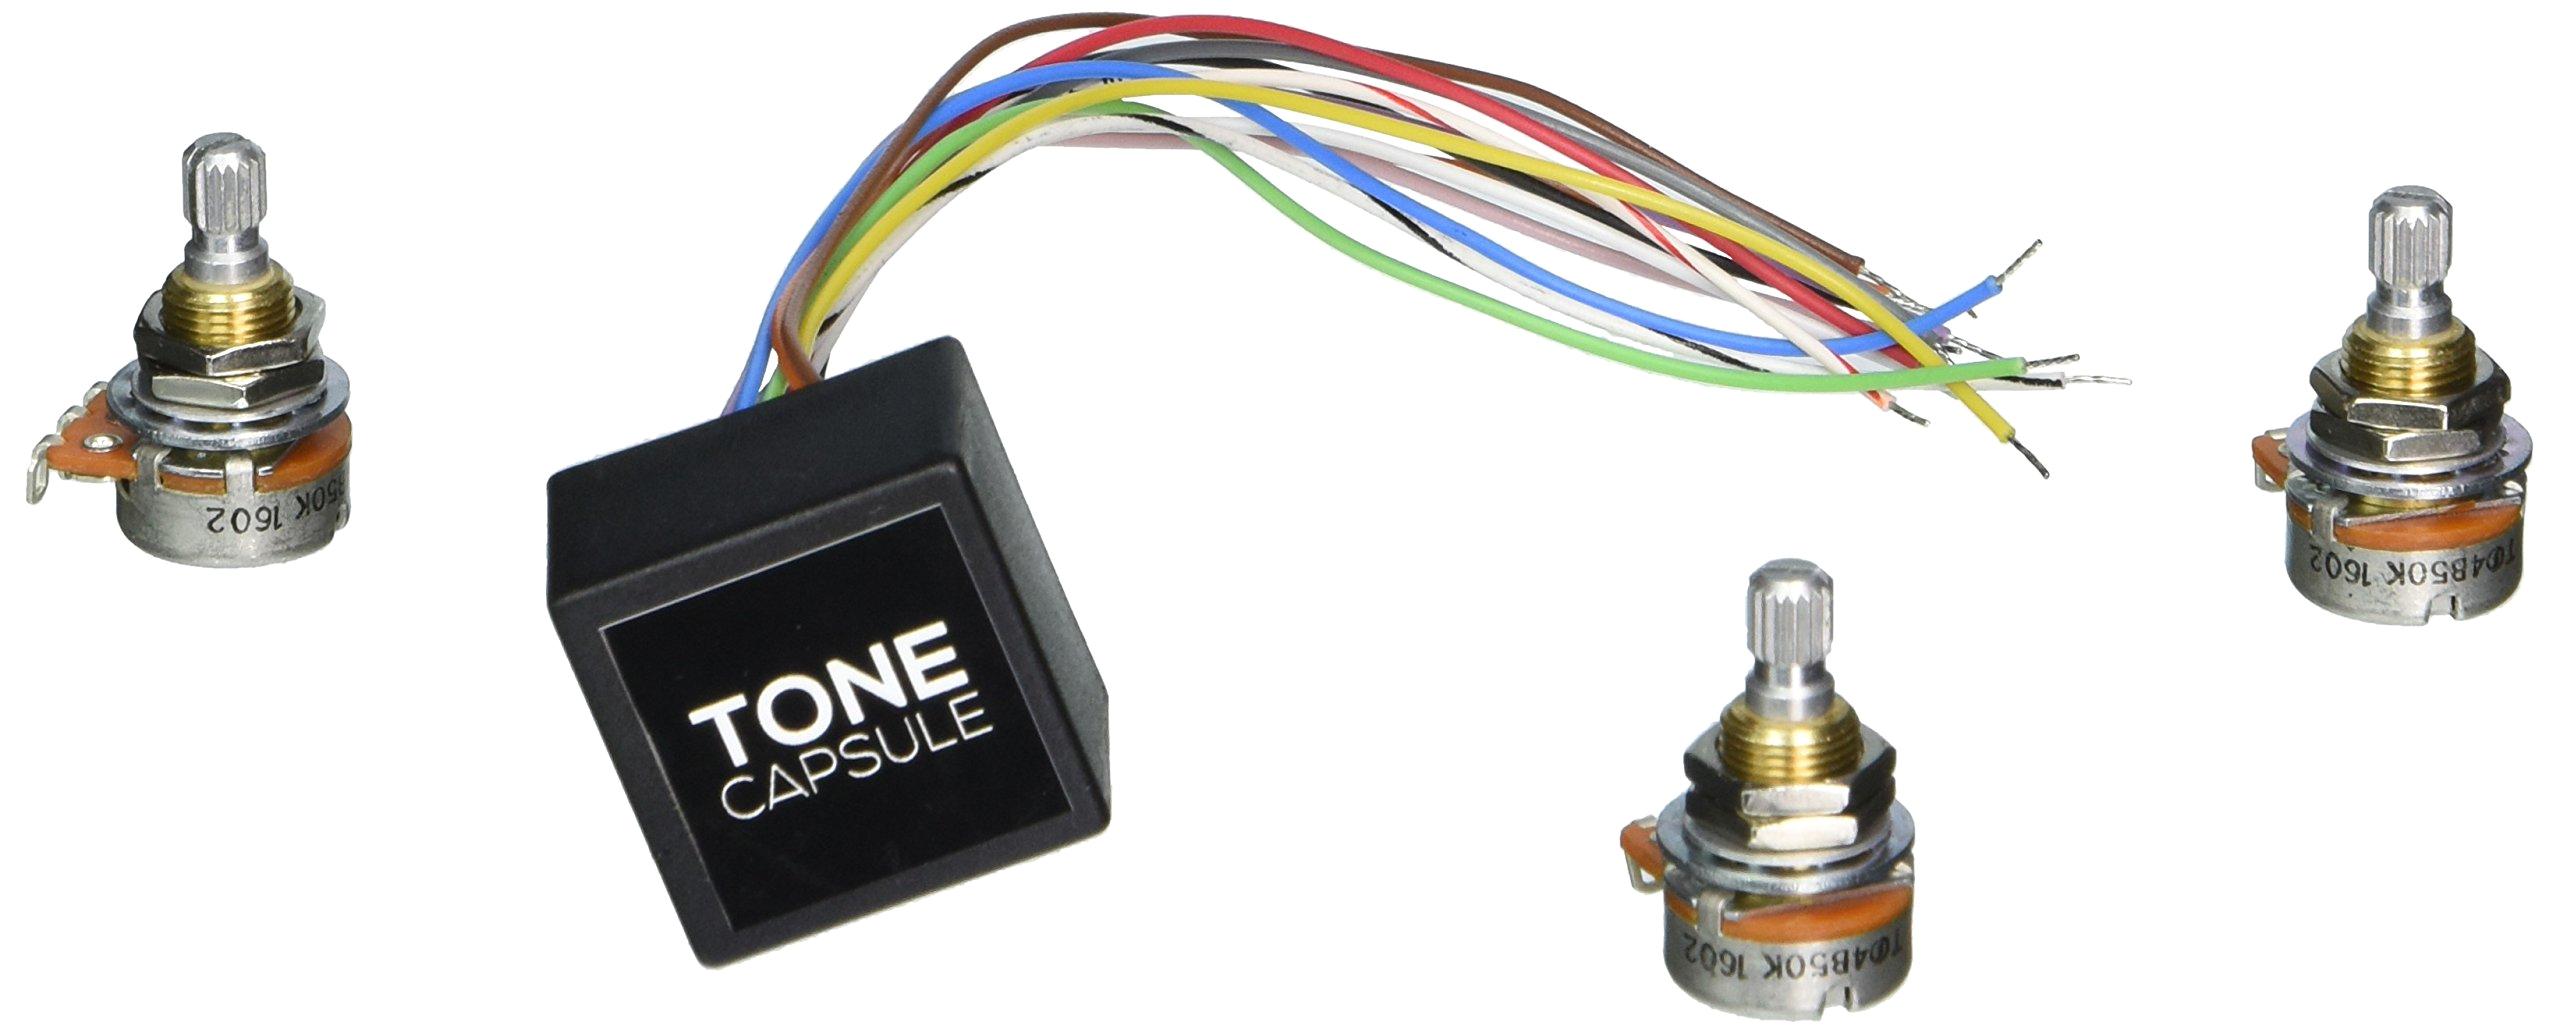 Darkglass tone Capsule Wiring Diagram Darkglass Electronics Desertcart